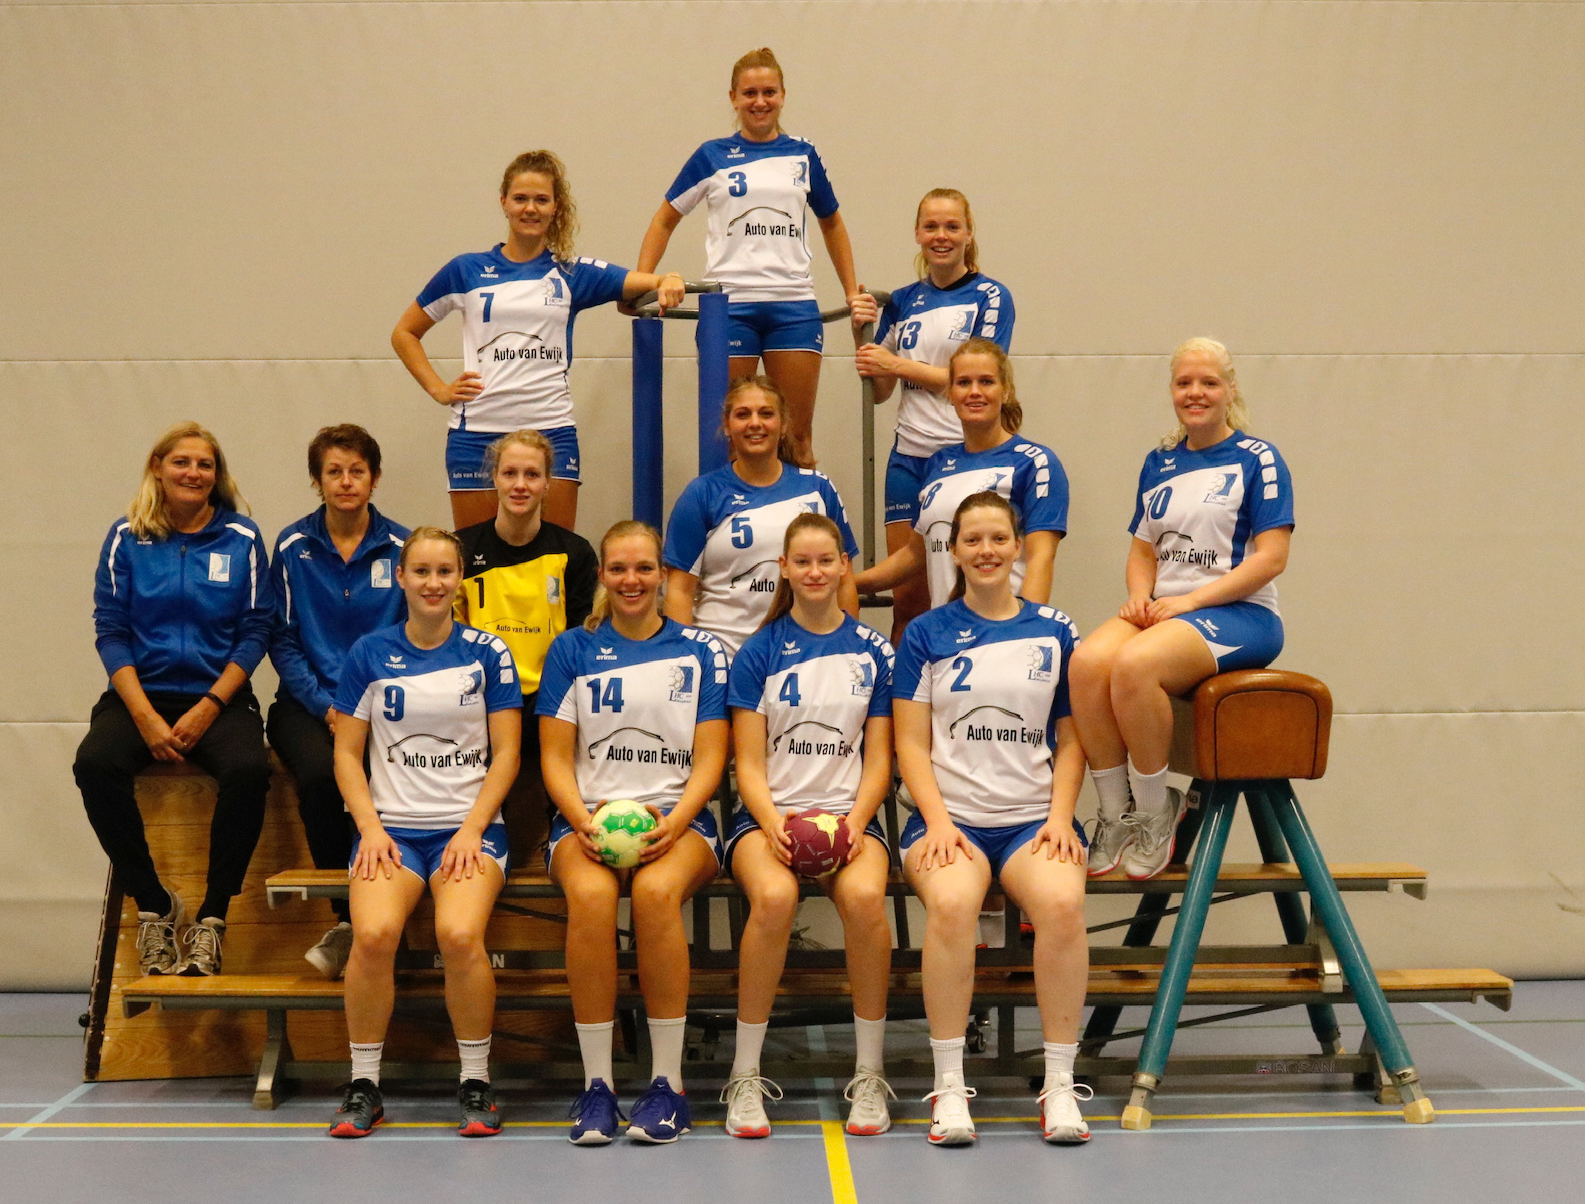 Dames 1 Handbalvereniging LHC